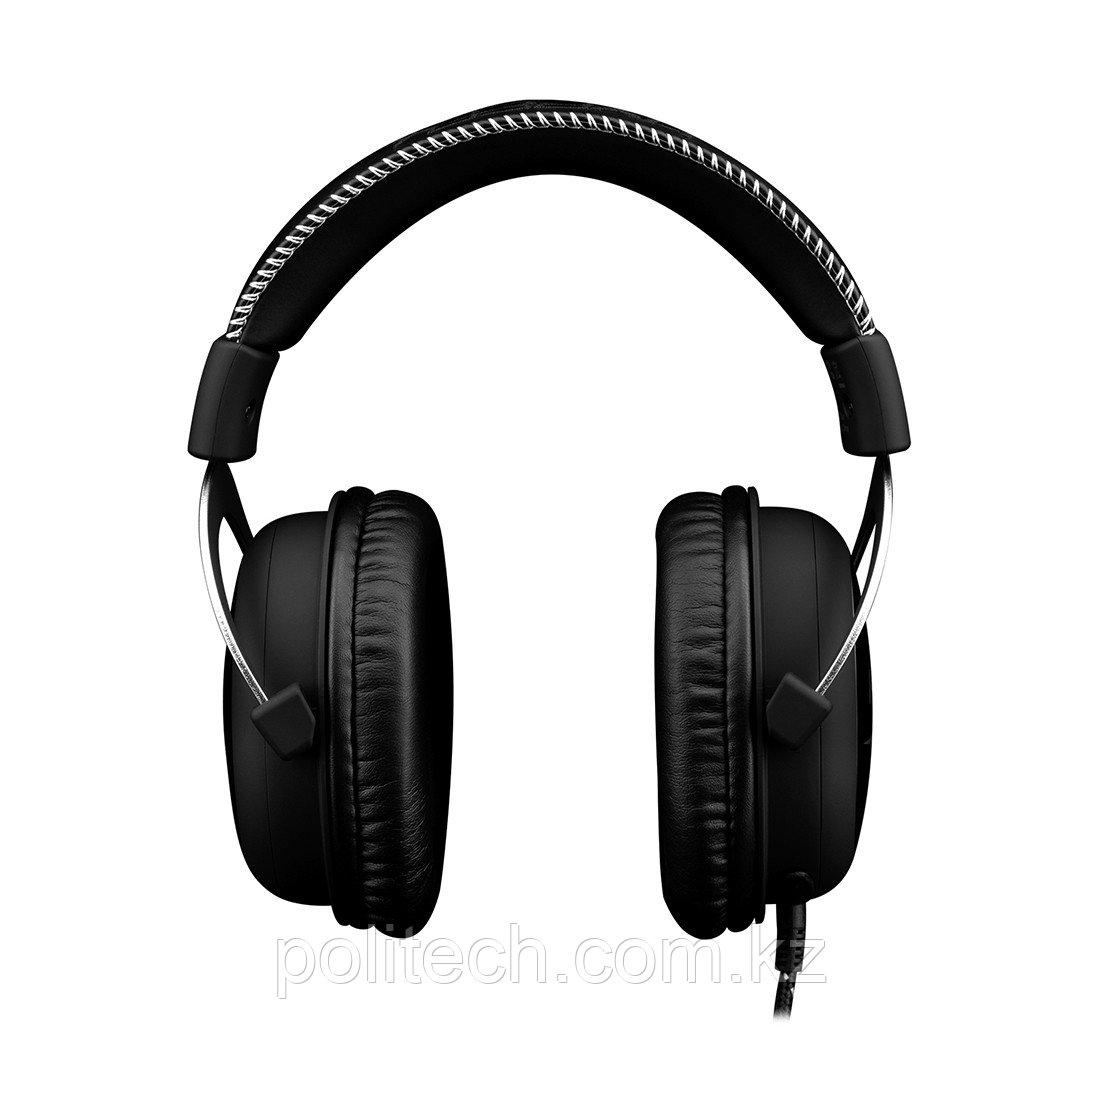 Гарнитура HyperX Cloud Gaming Headset - Silver HX-HSCL-SR/NA